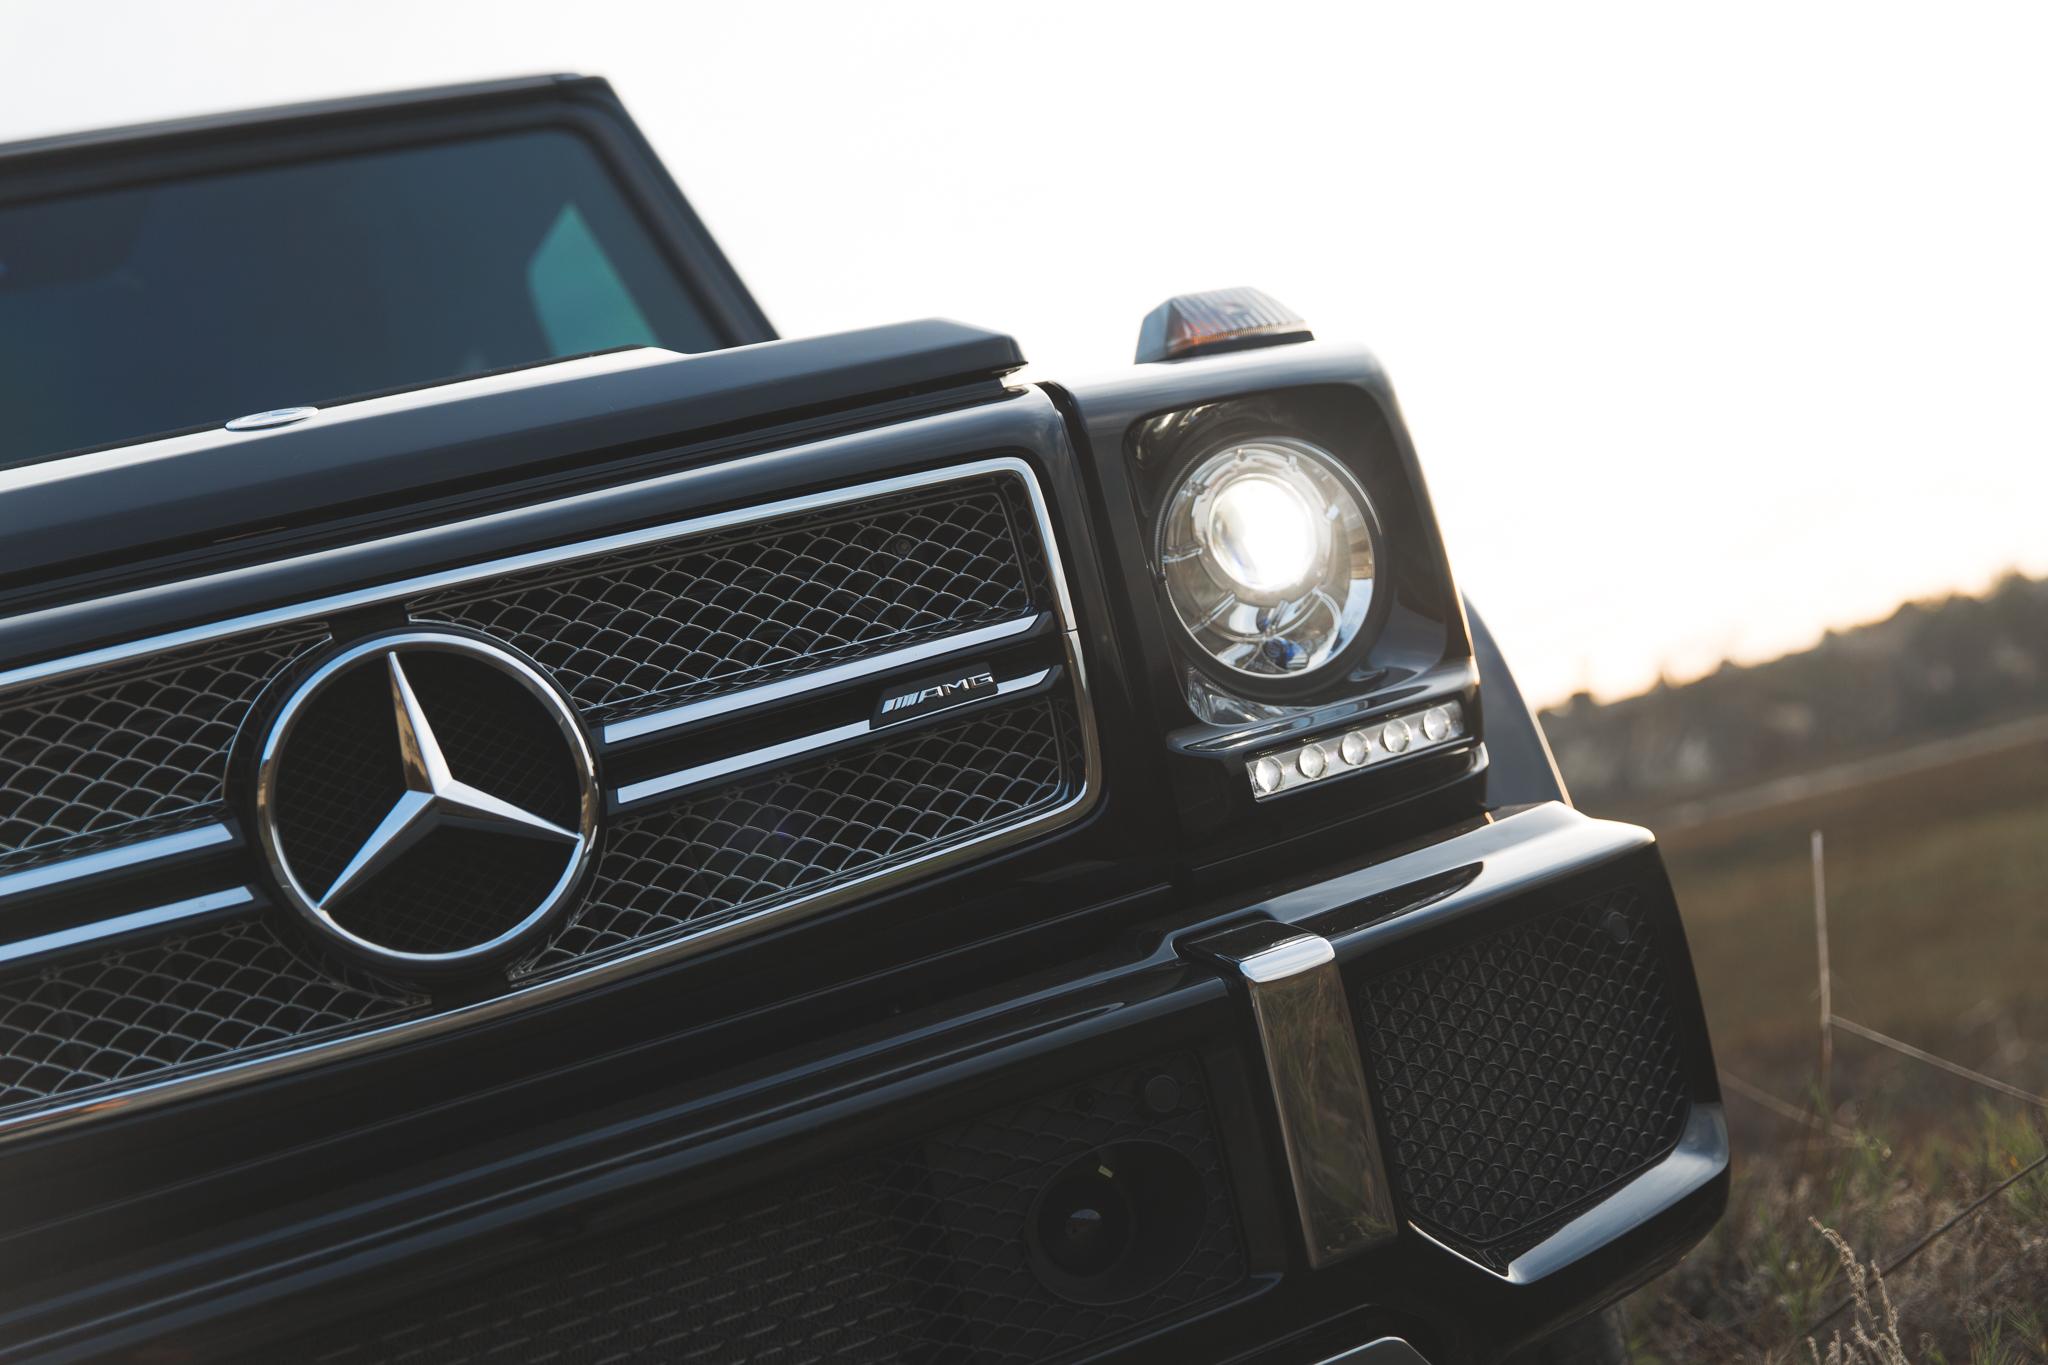 Stay_Driven_Mercedes G65_Back_Bay-36.jpg